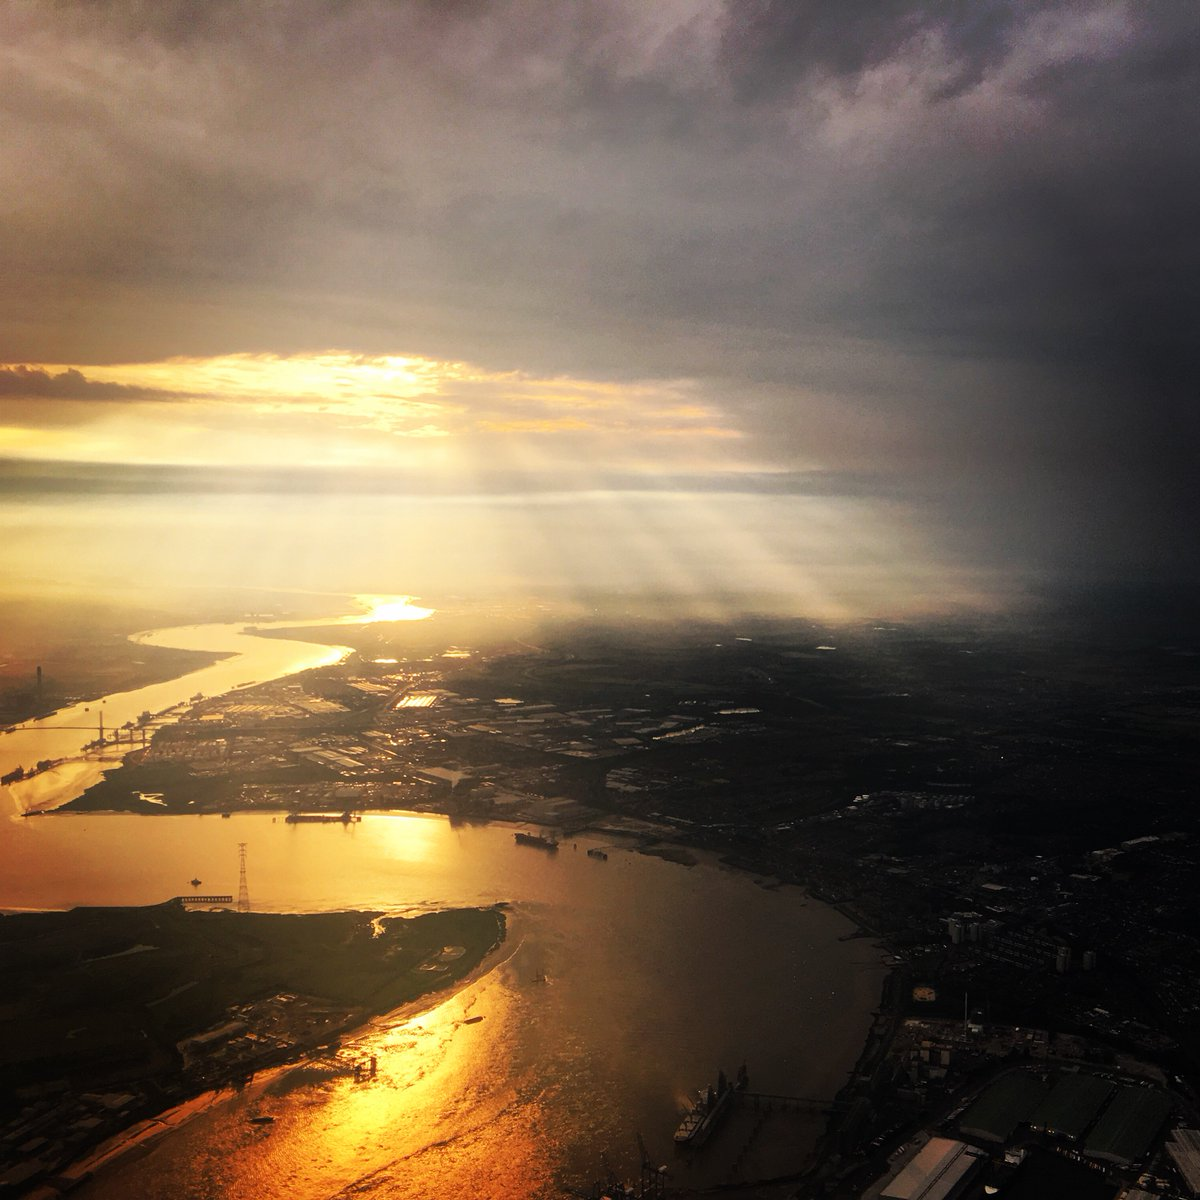 Rivers of Gold on approach to @LondonCityAir last night. #skyfaring cc: @markv747 https://t.co/WbuL4QfeGk